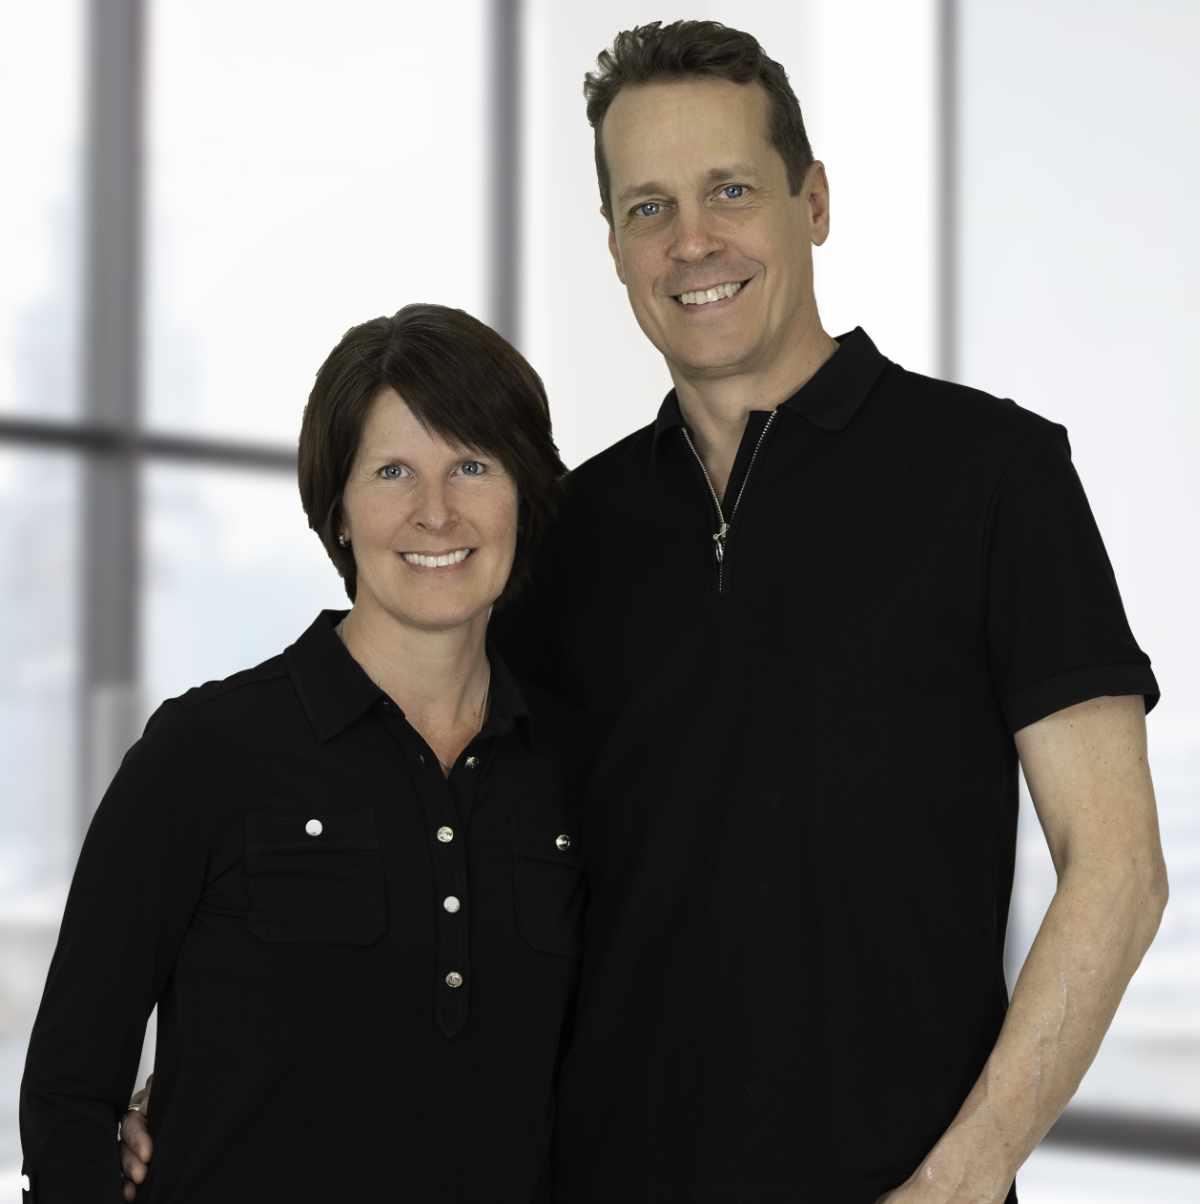 John and Maria Soderlund